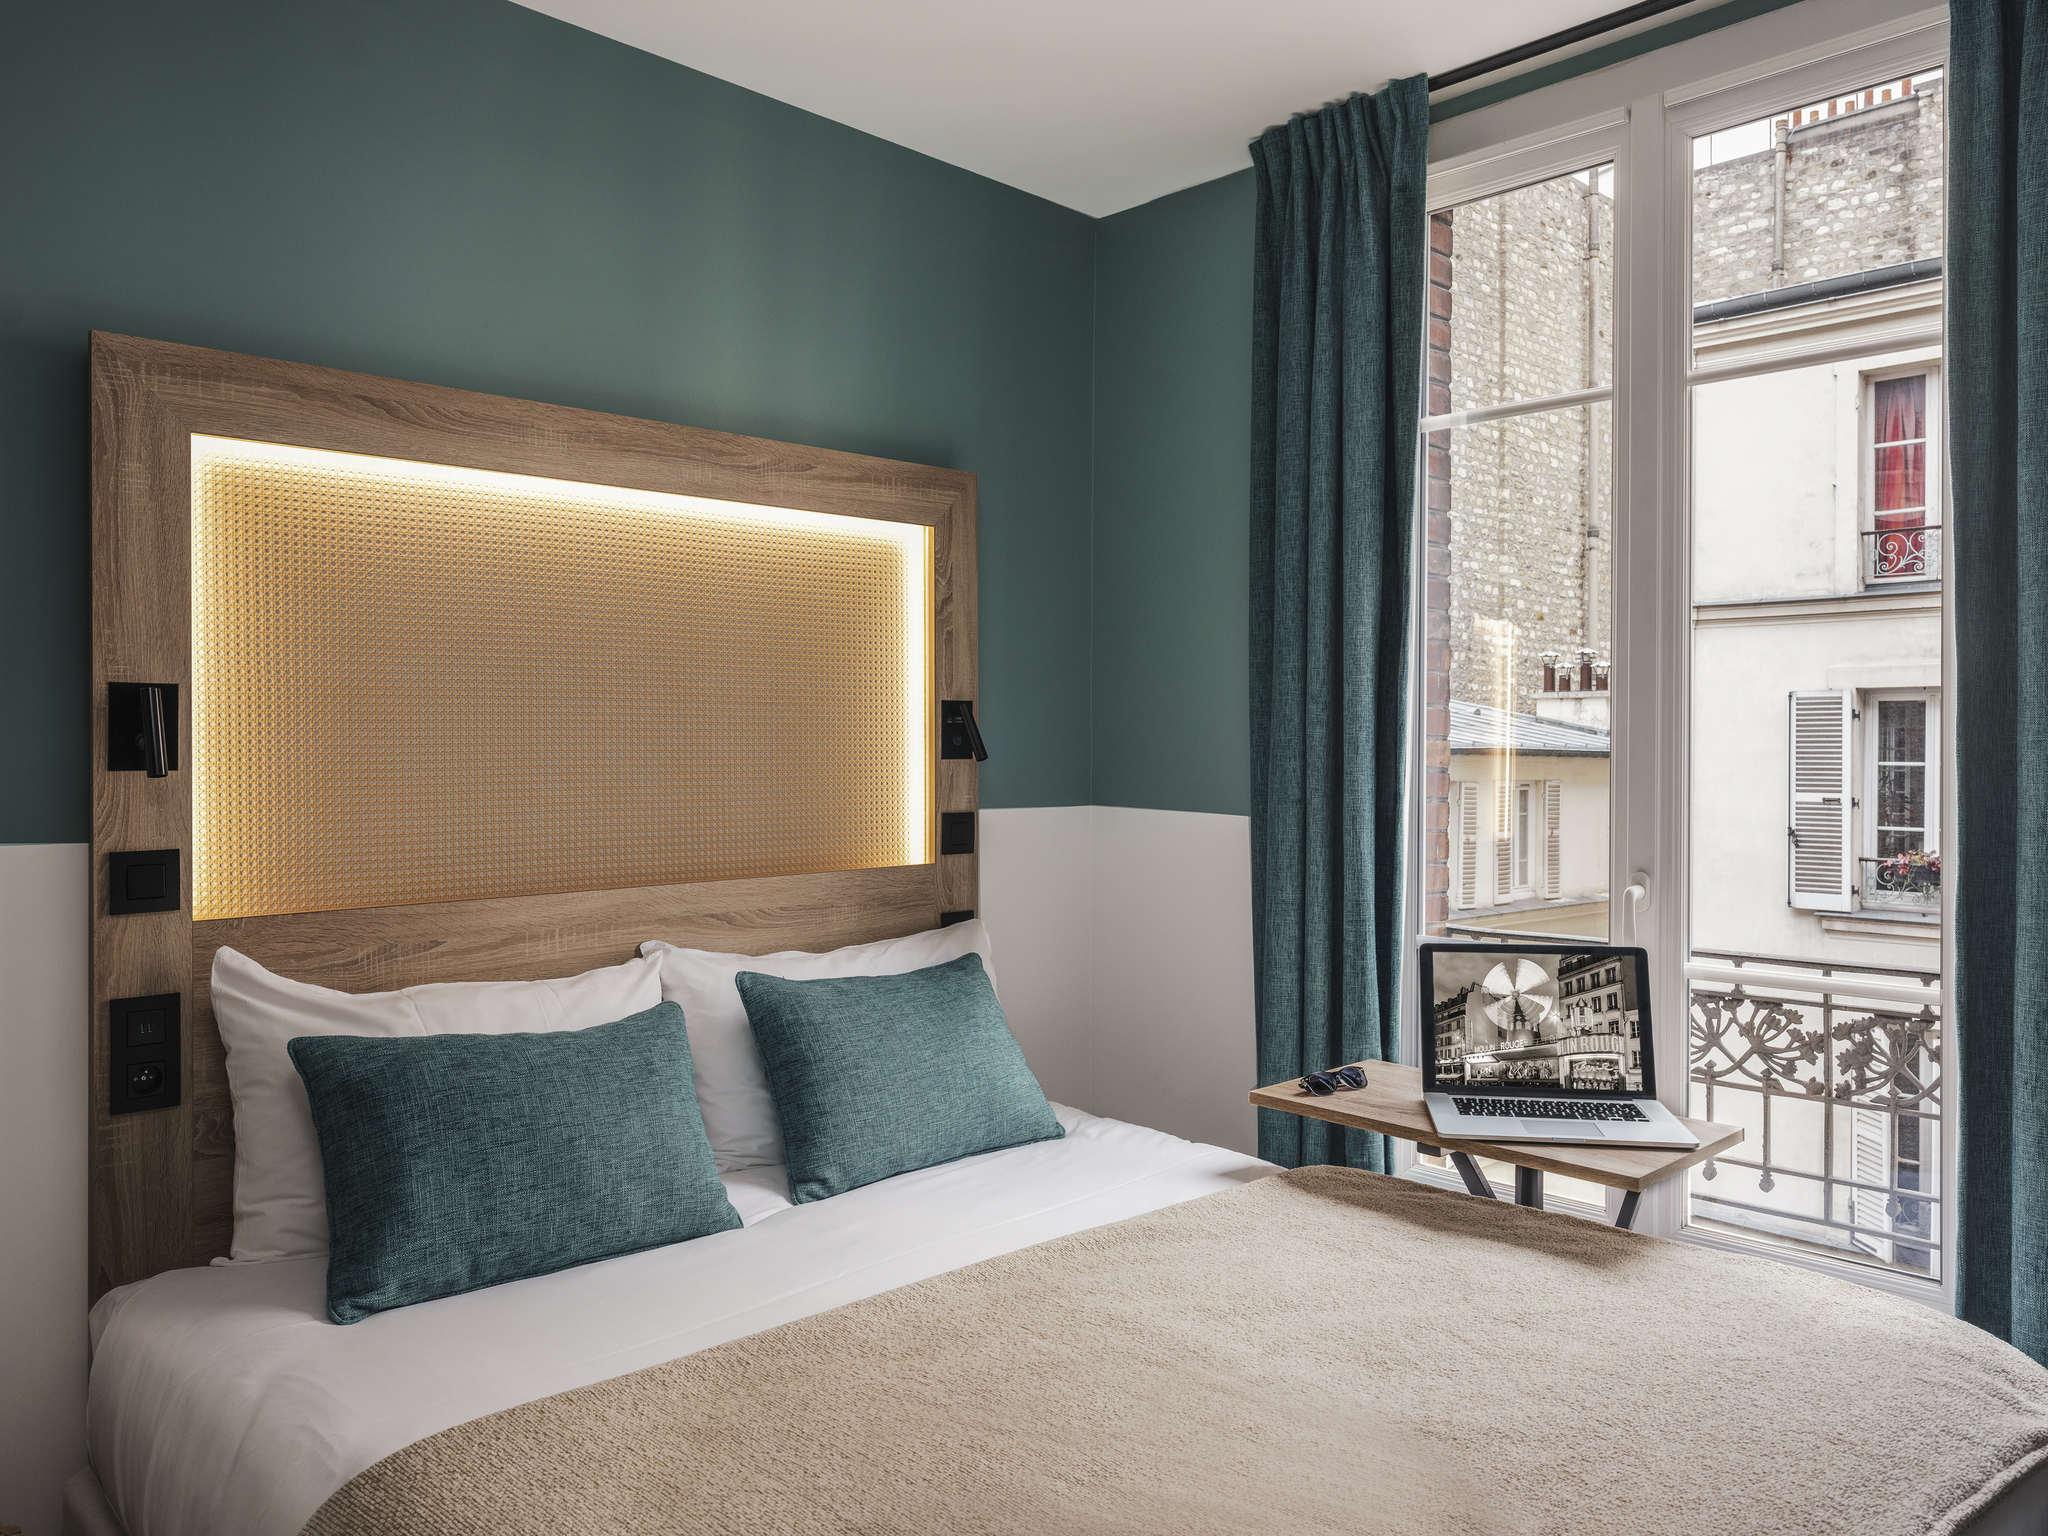 فندق - إيبيس ستايلز ibis Styles مونمارتر نور